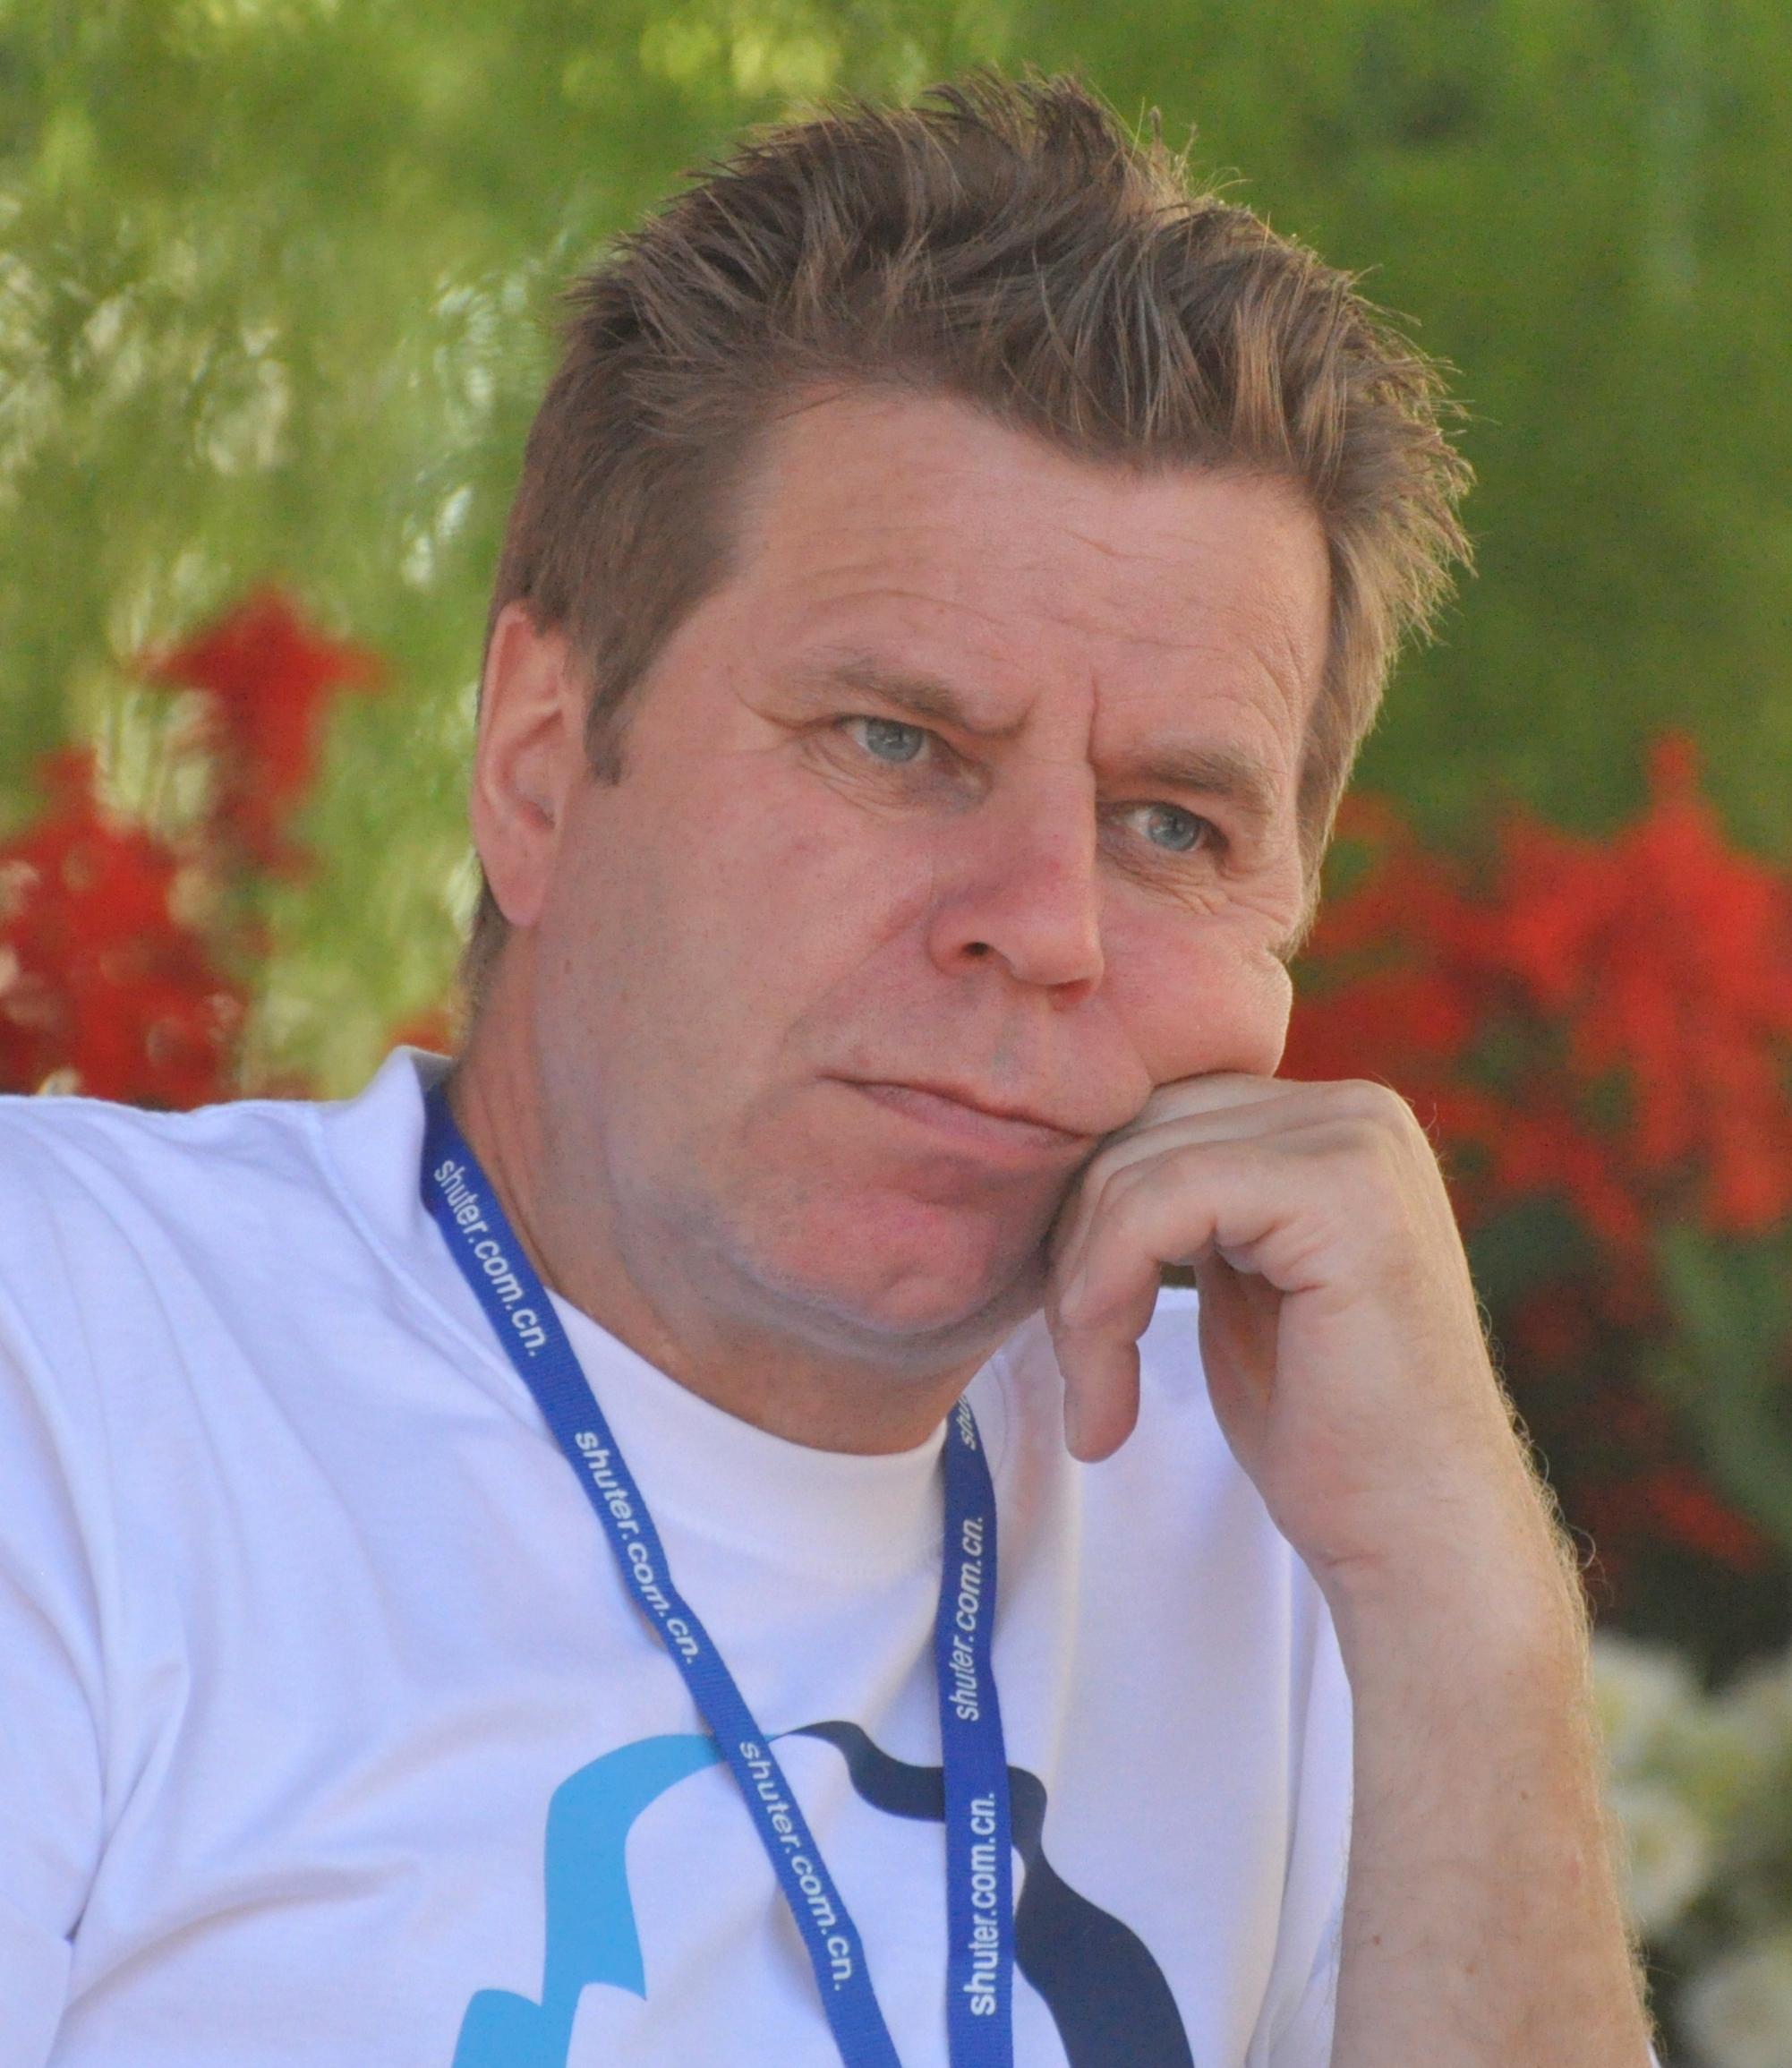 Mato Valtonen in 2011.